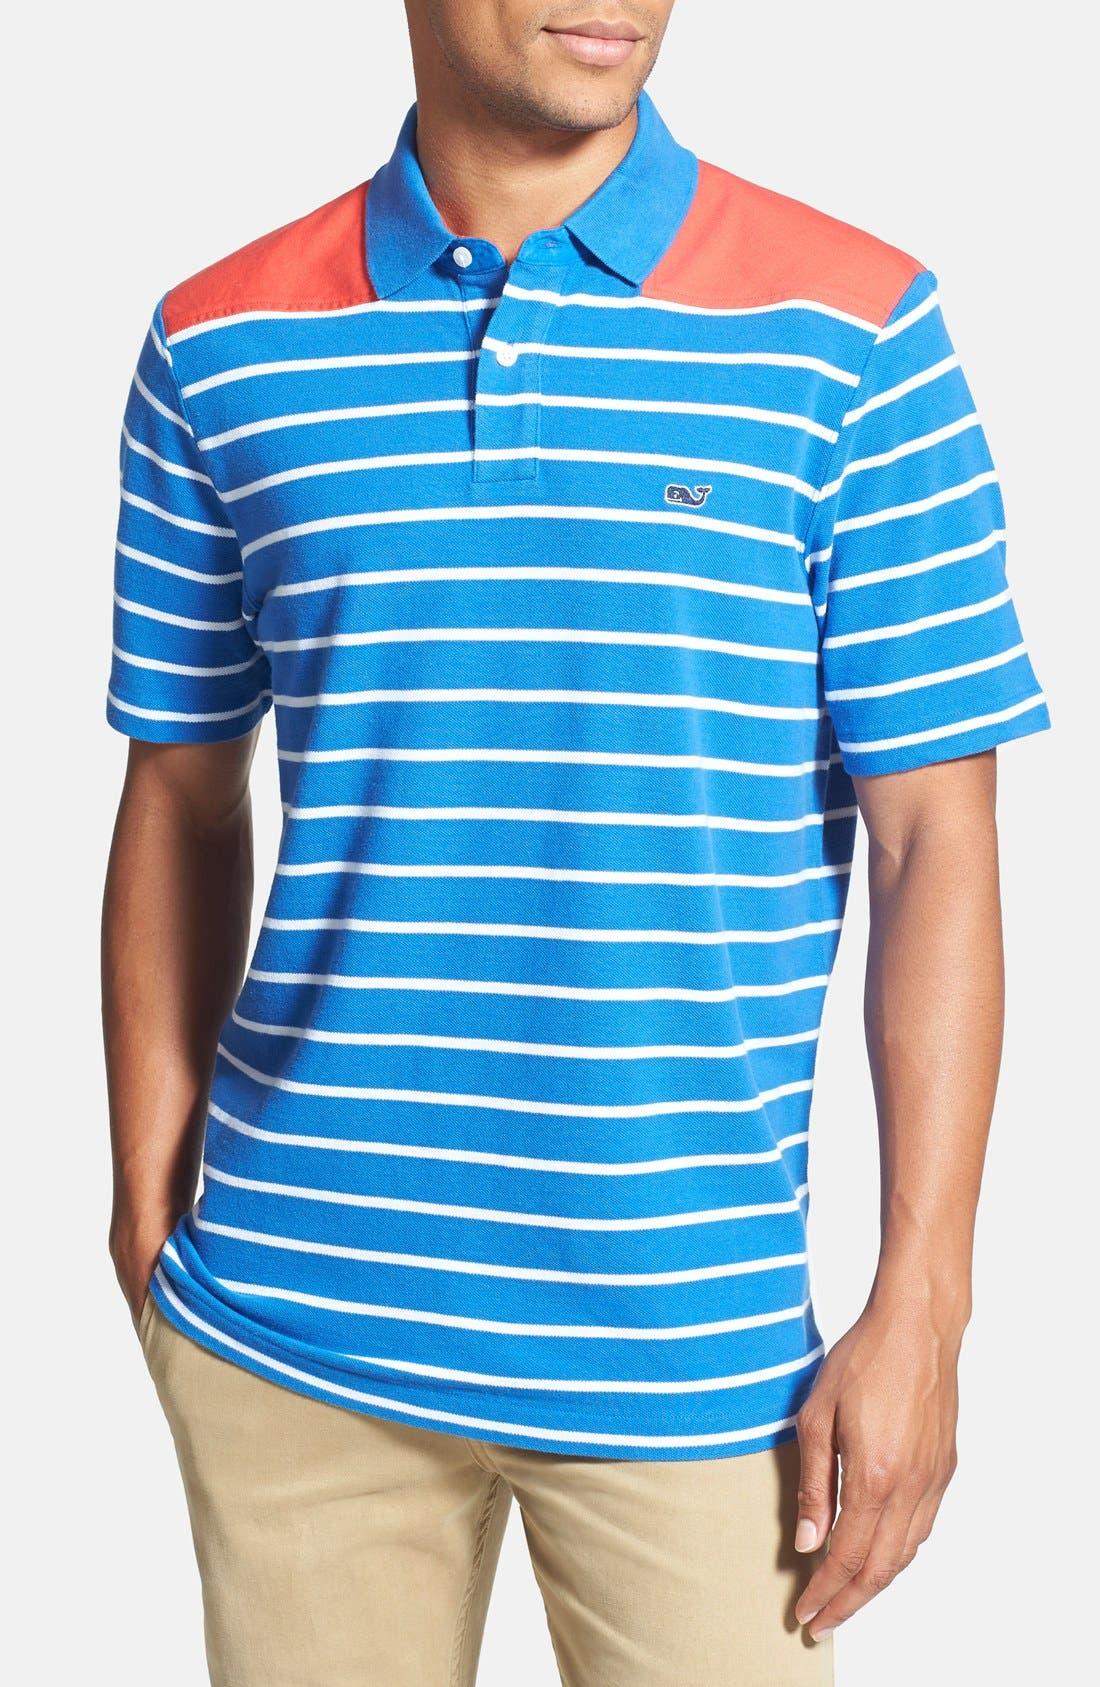 Alternate Image 1 Selected - Vineyard Vines 'Shep' Stripe Polo Shirt